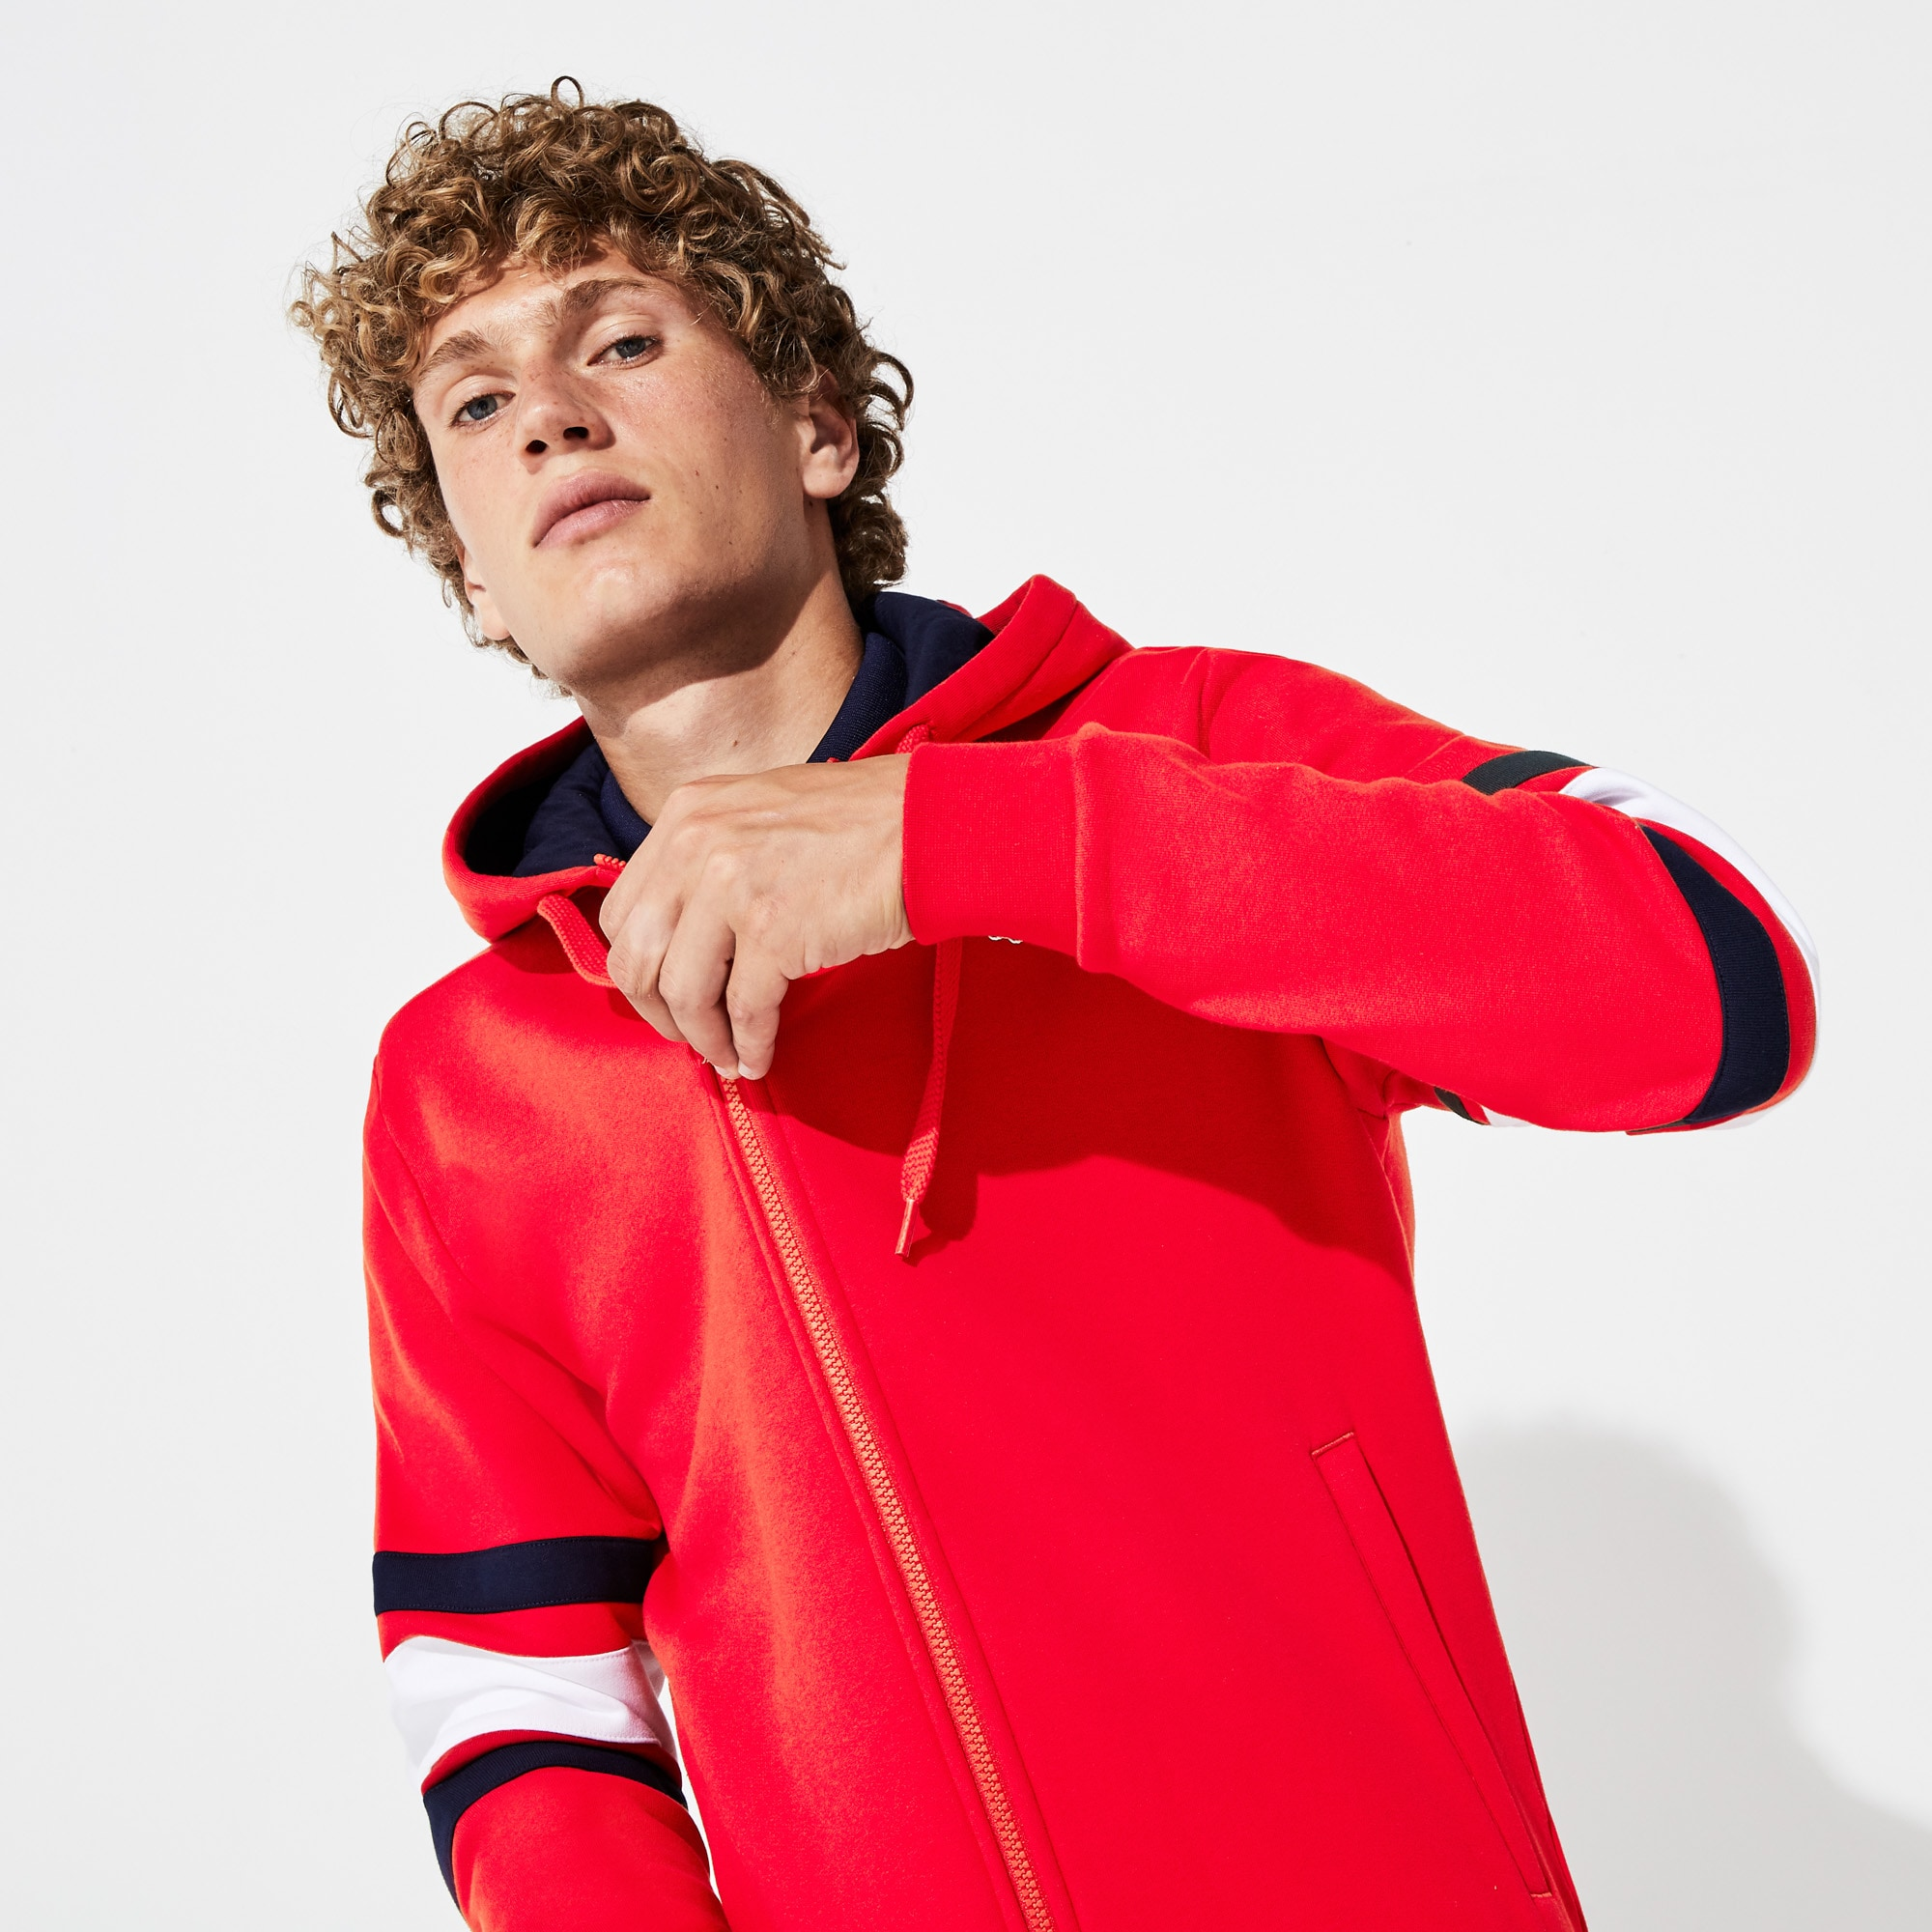 Lacoste Tops Men's SPORT Striped-Sleeve Hooded Zip Sweatshirt